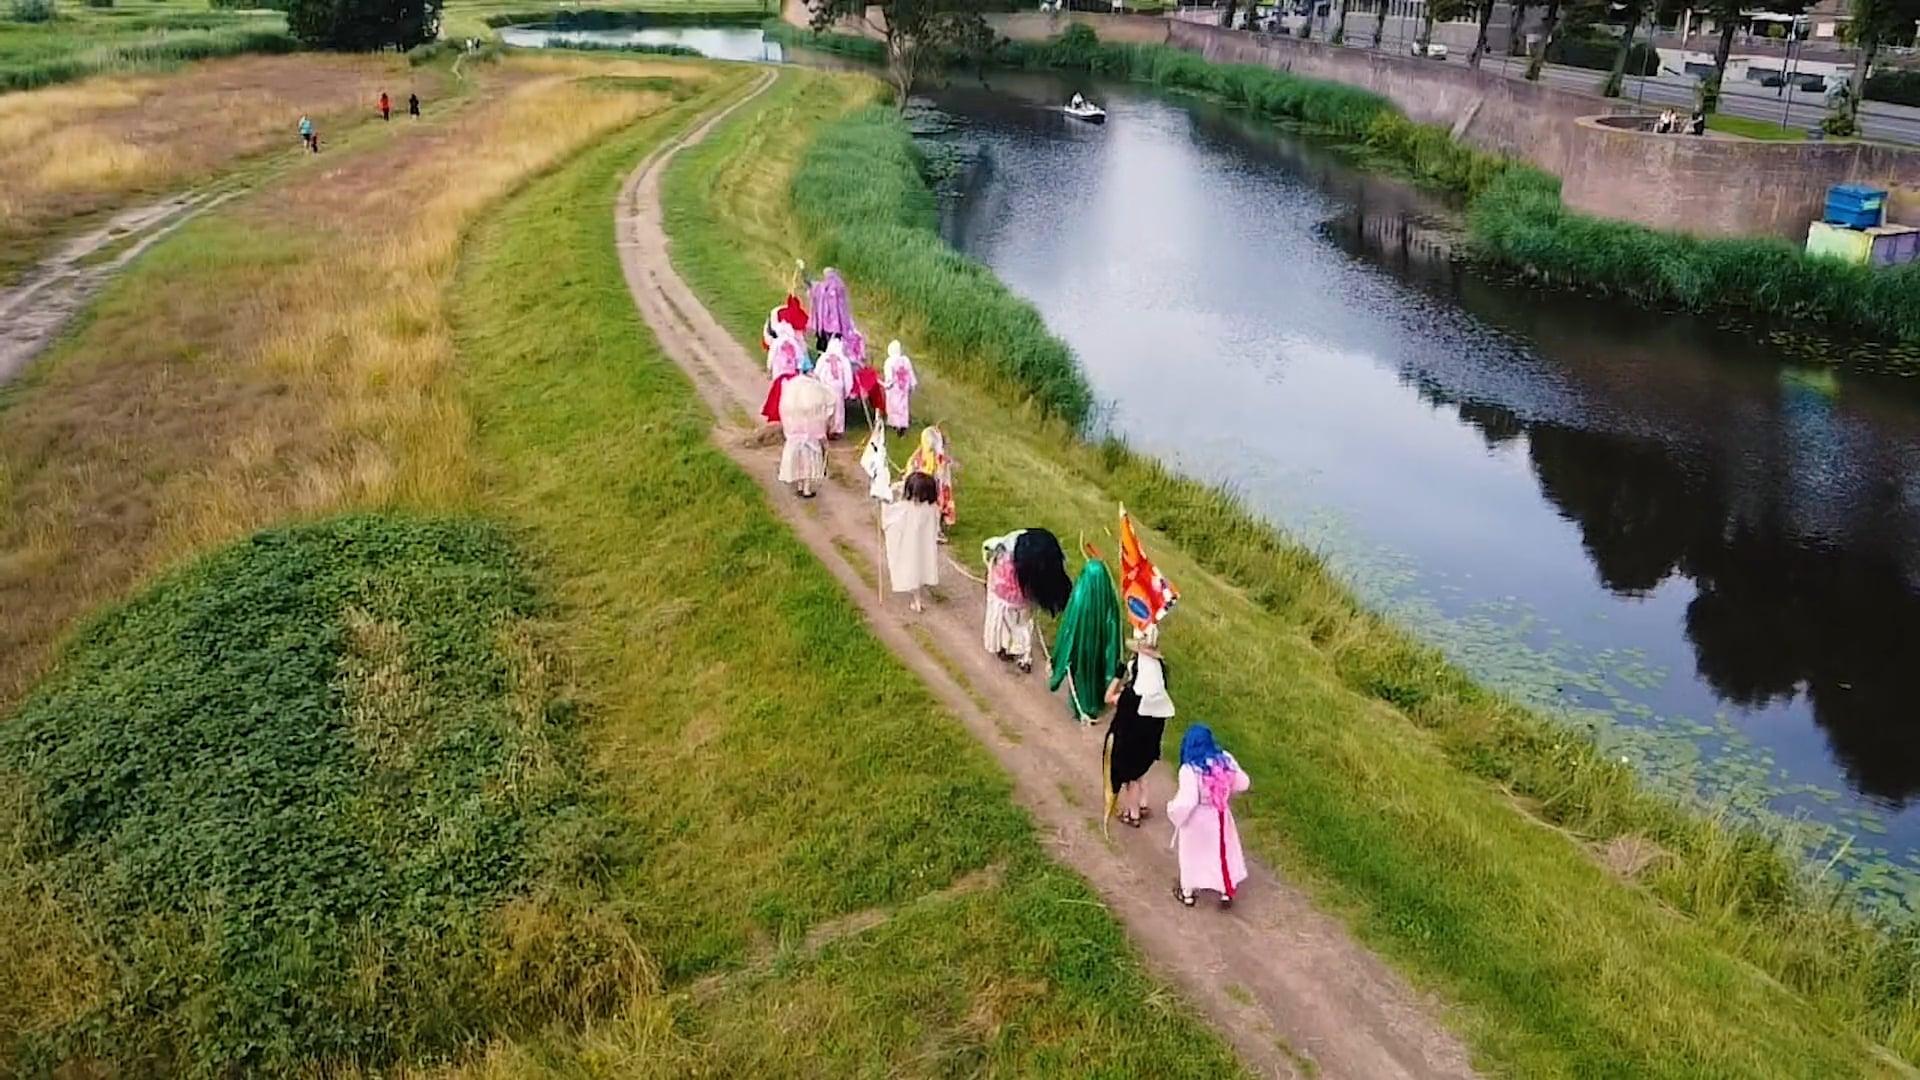 Folkert de Jong & Wij Familie - Bosch Parade openingsweekend Bossche Zomer 2021